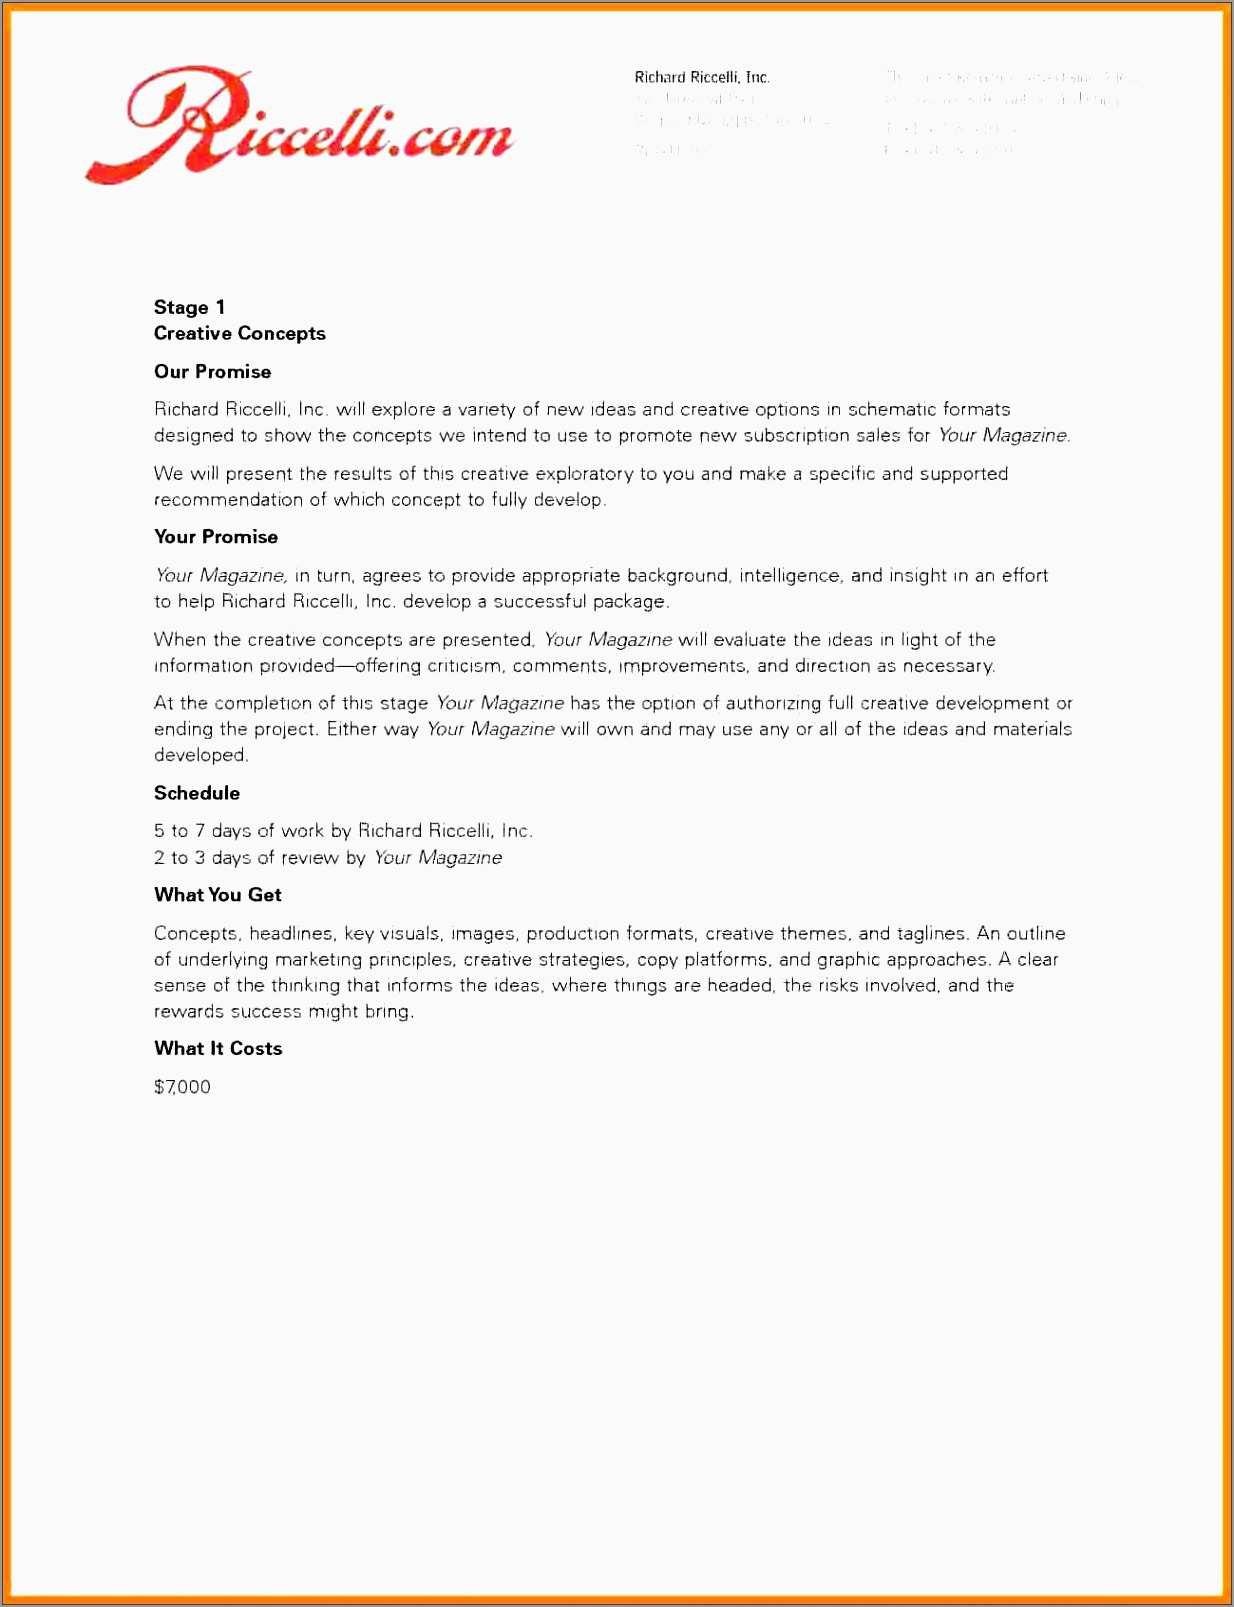 Elegant Free Advertising Proposal Template  Best Of Template with regard to Advertising Proposal Template